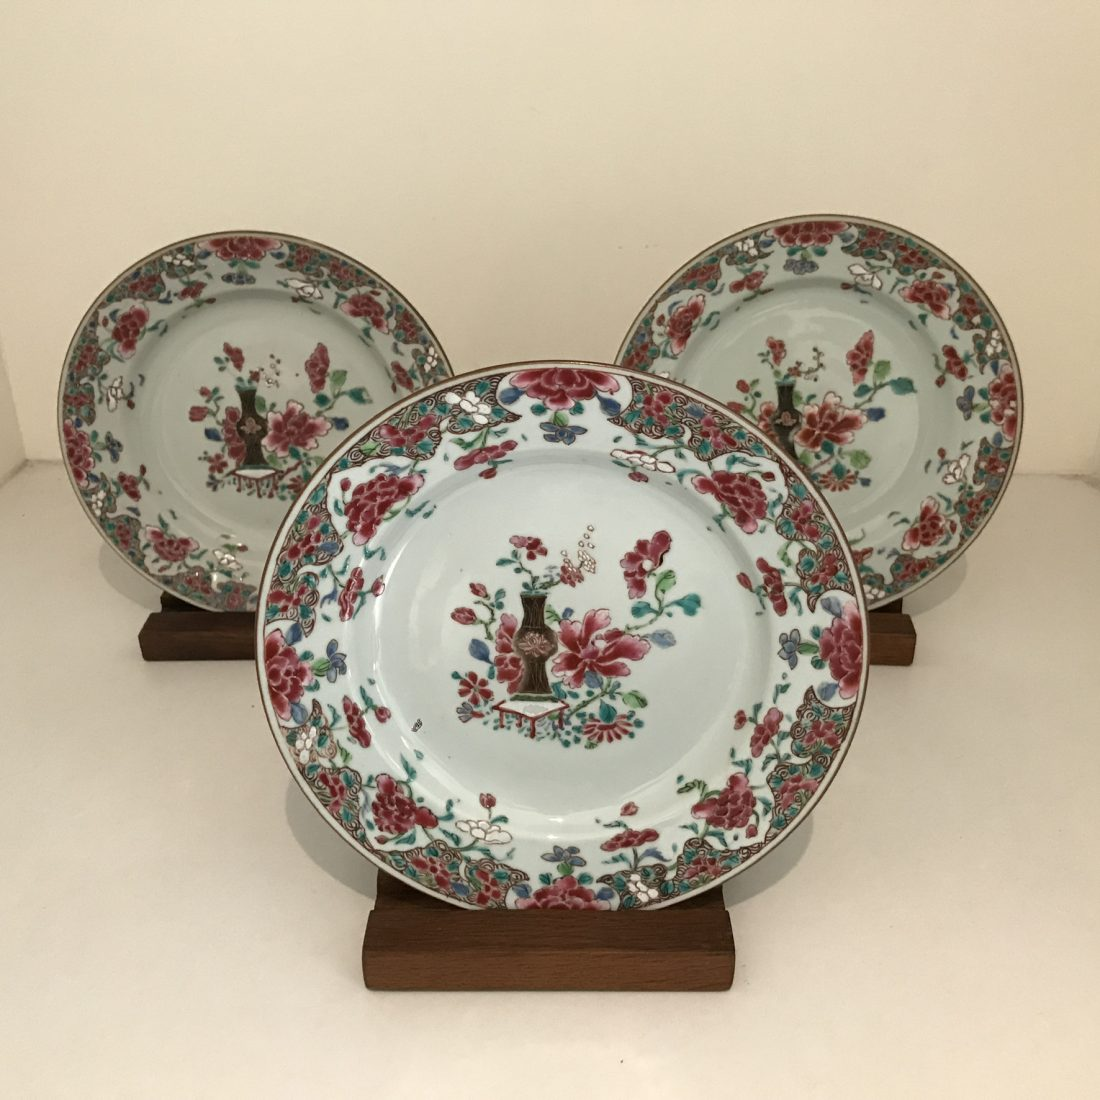 Famille rose porseleinen borden drie stuks, China, 18e eeuw